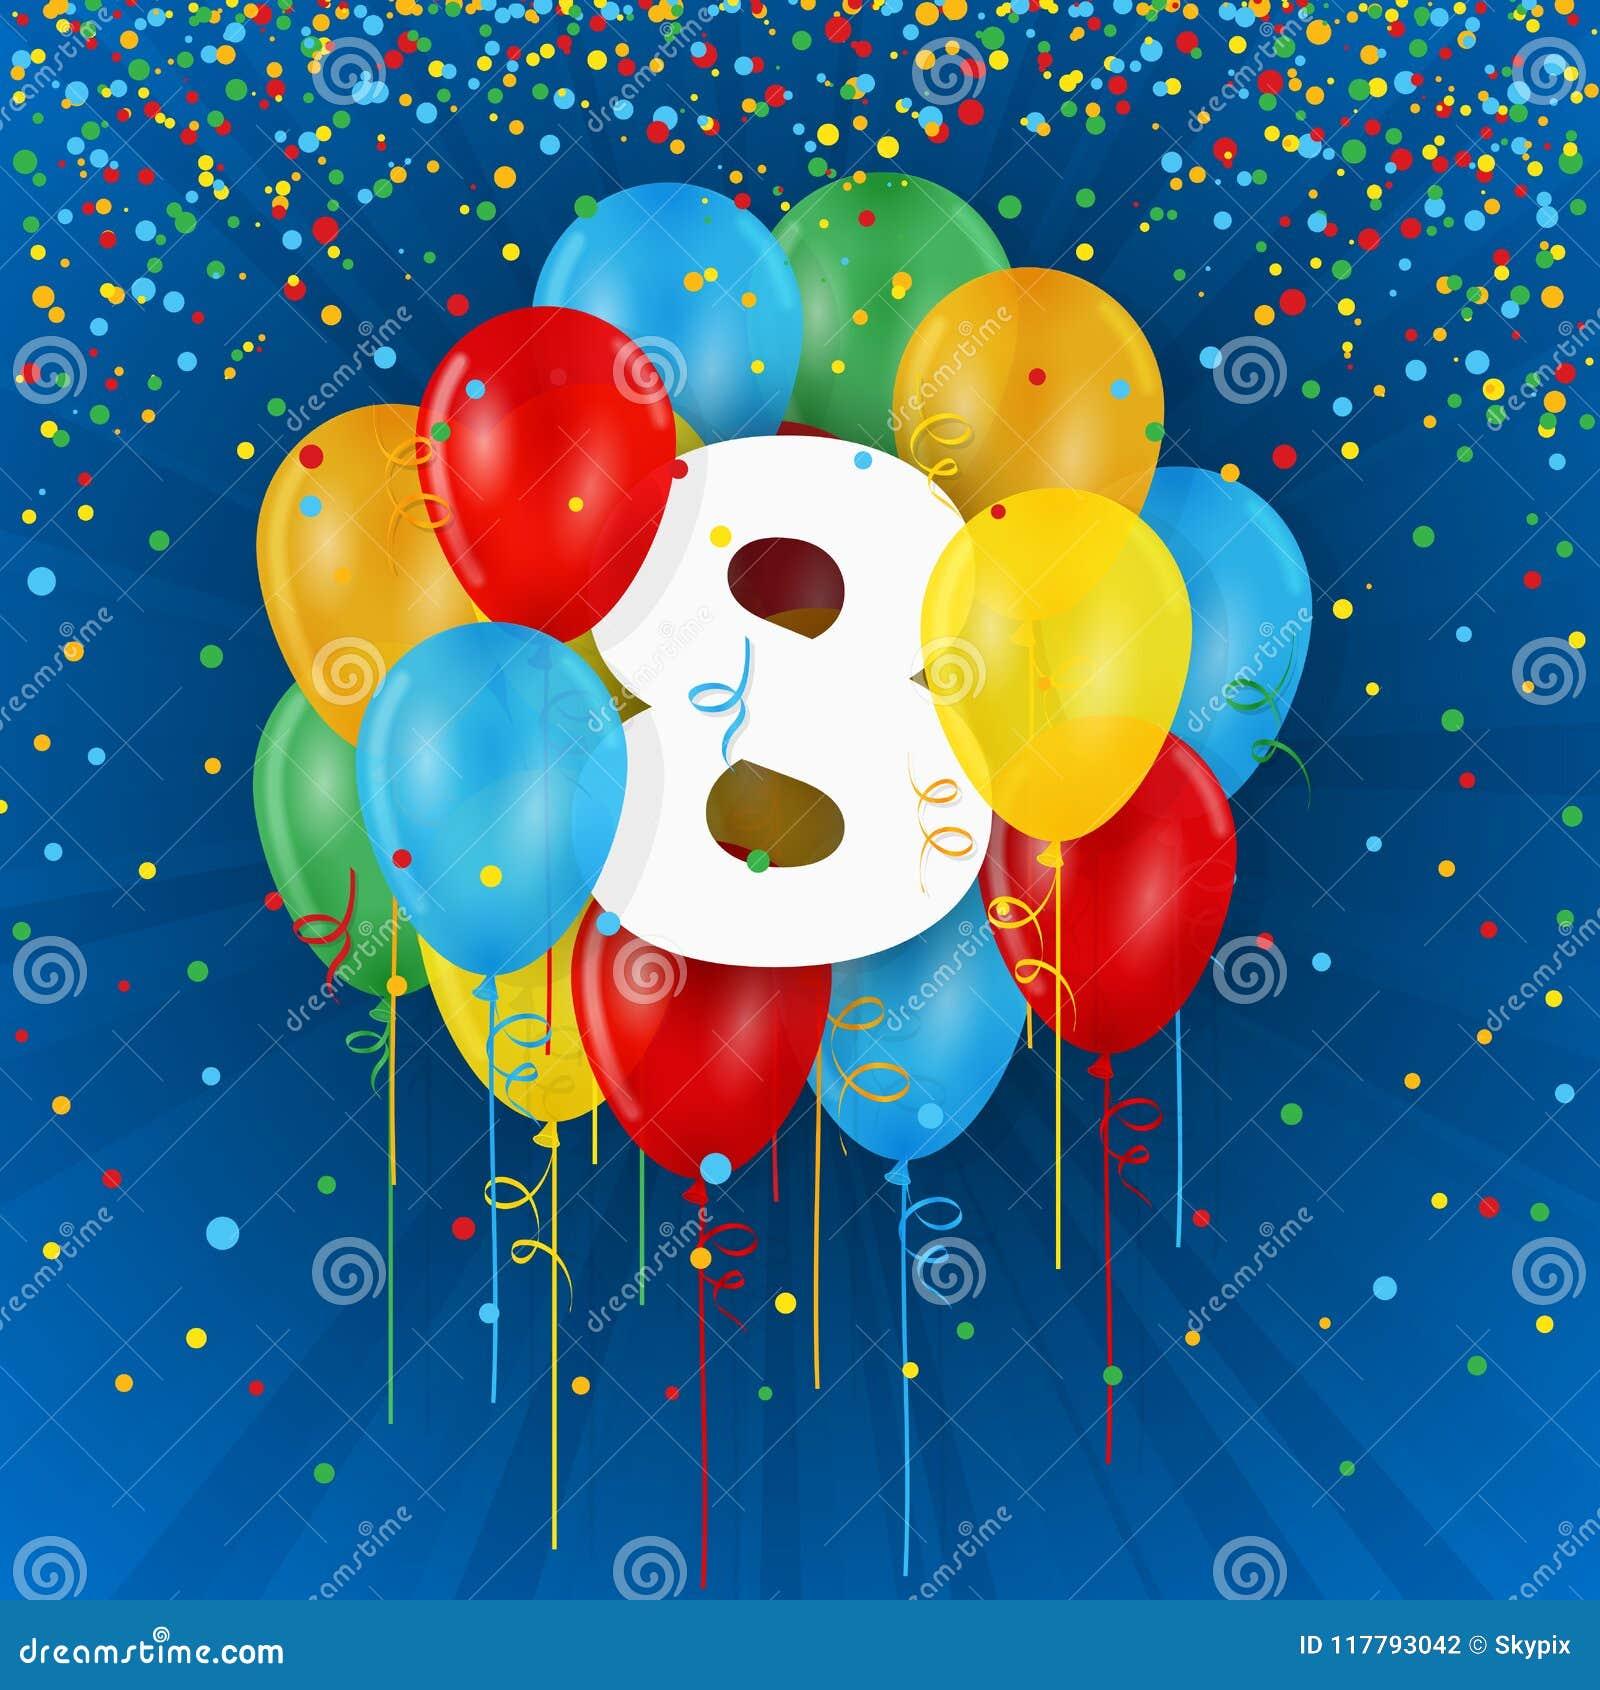 Gelukkige 8ste Verjaardag Verjaardagskaart Met Ballons Stock